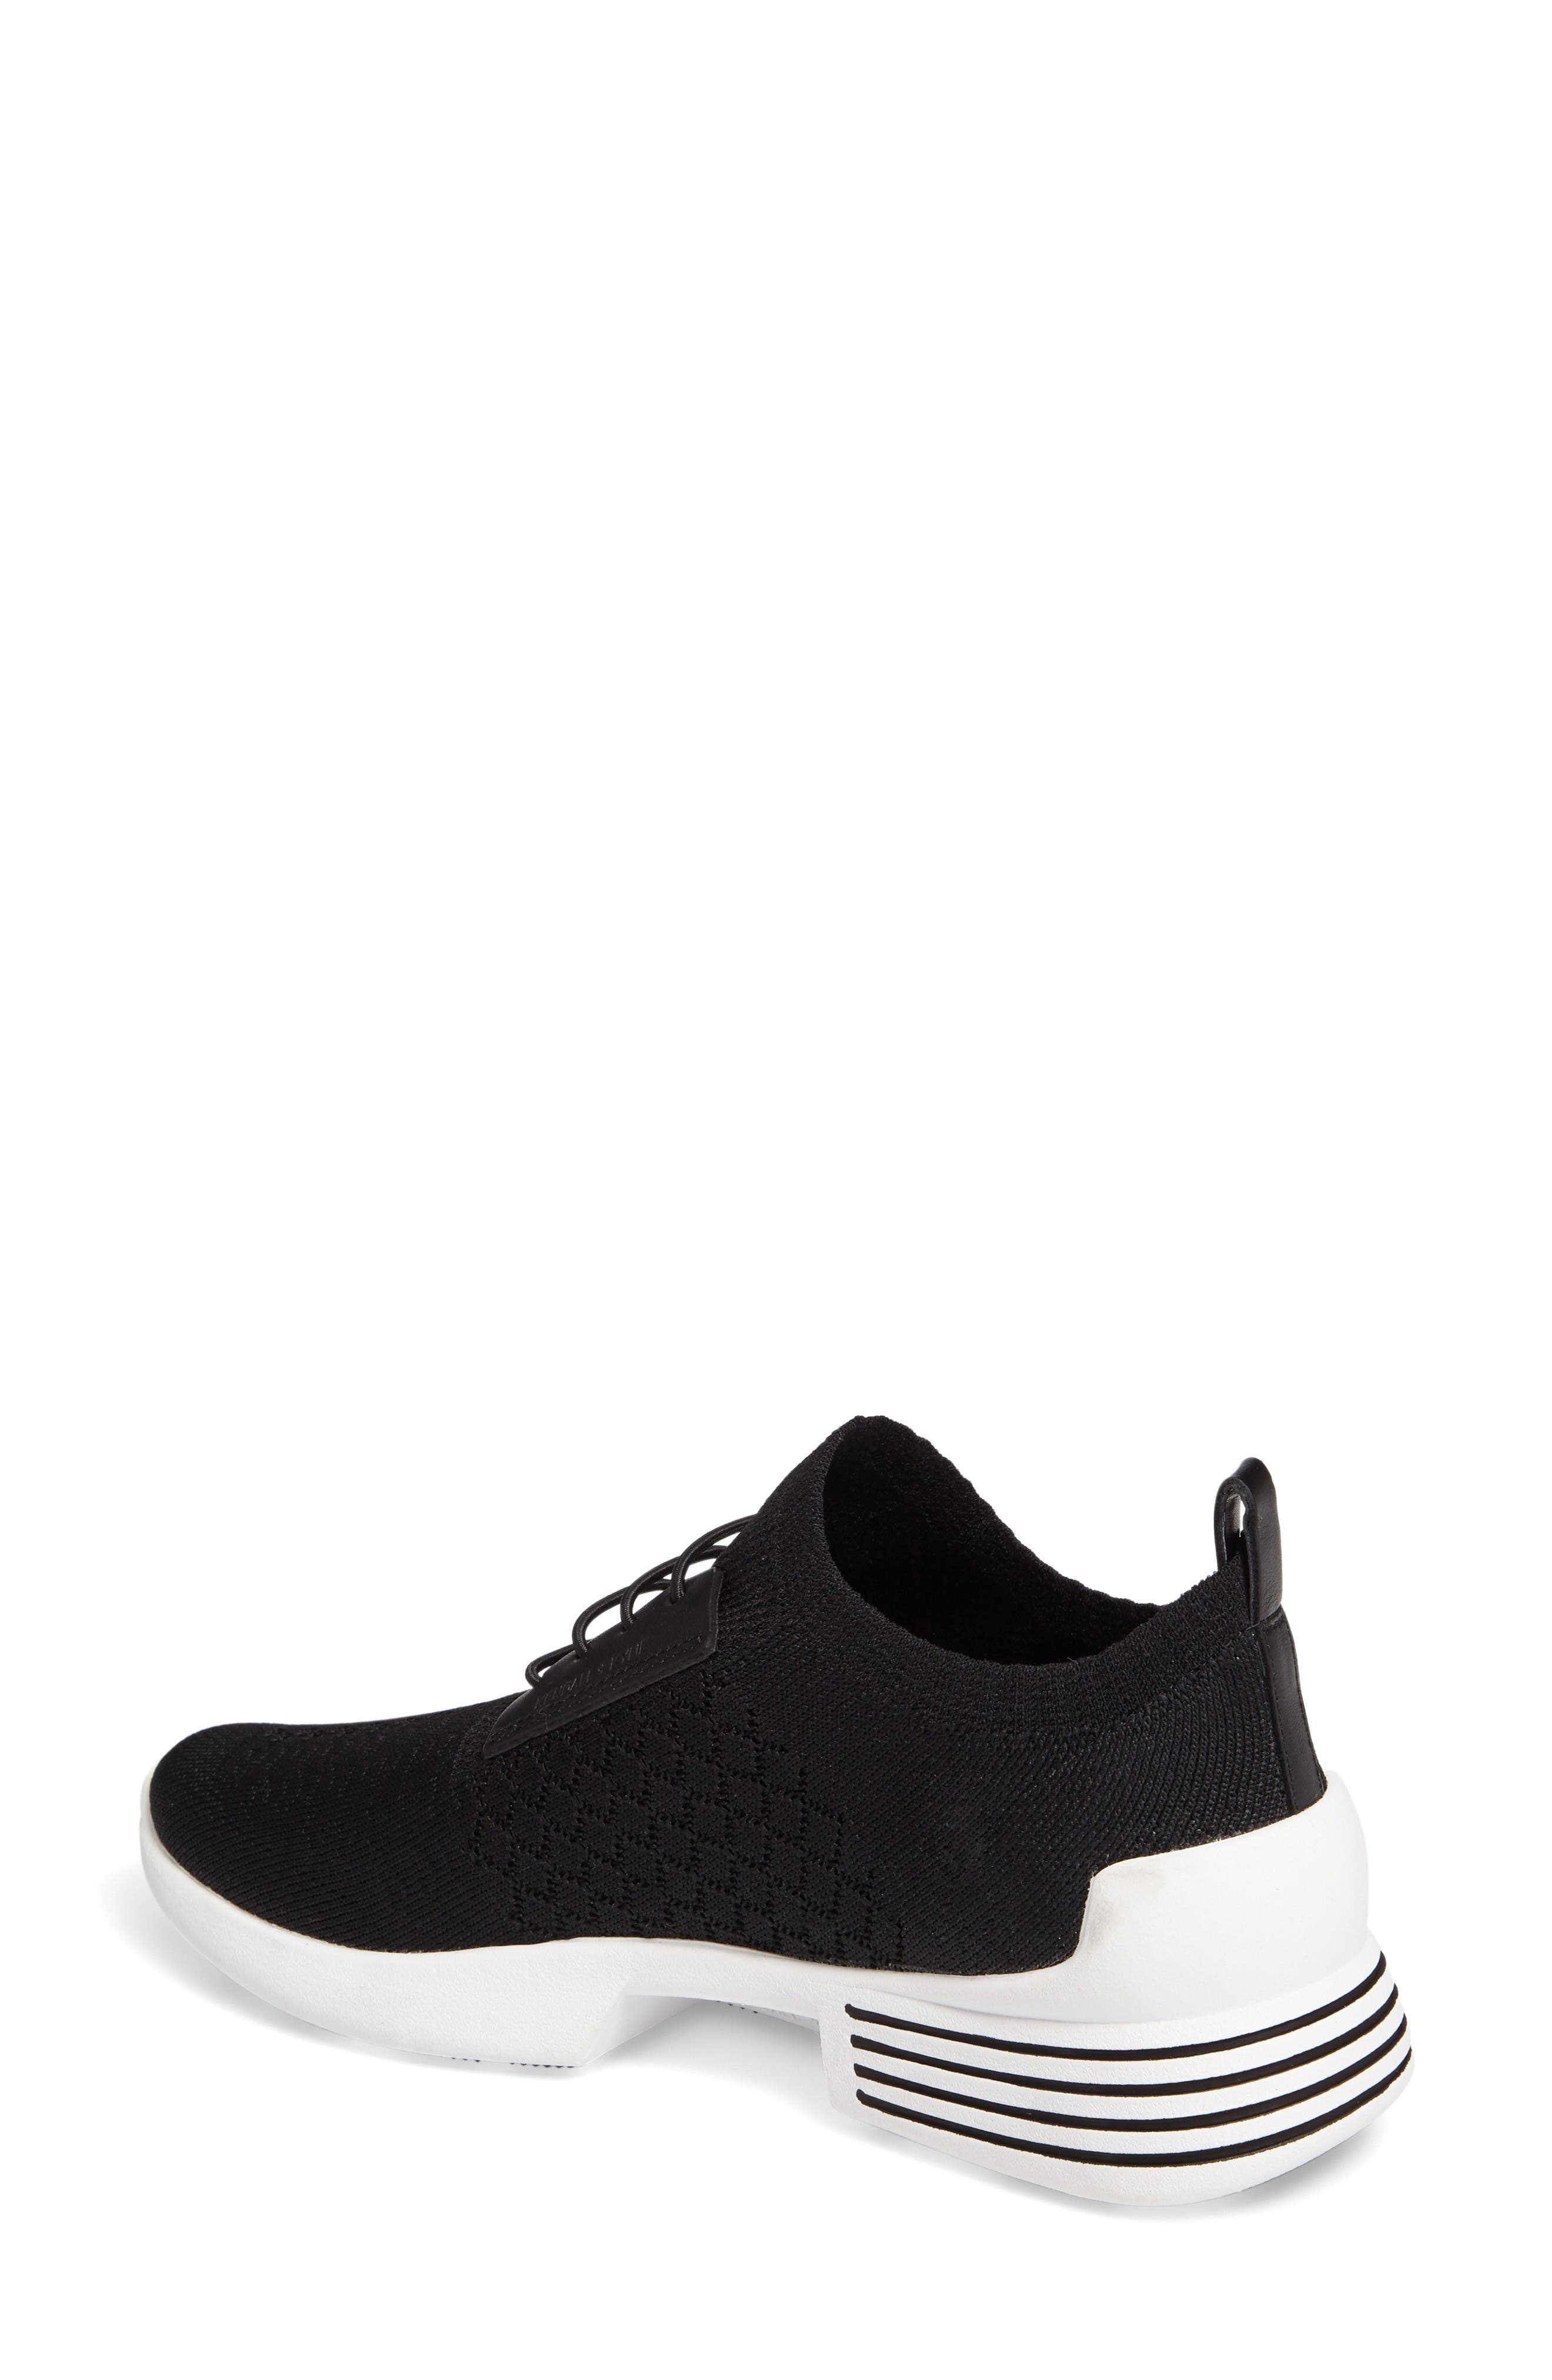 Brandy Woven Sneaker,                             Alternate thumbnail 2, color,                             Black/ Black Fabric